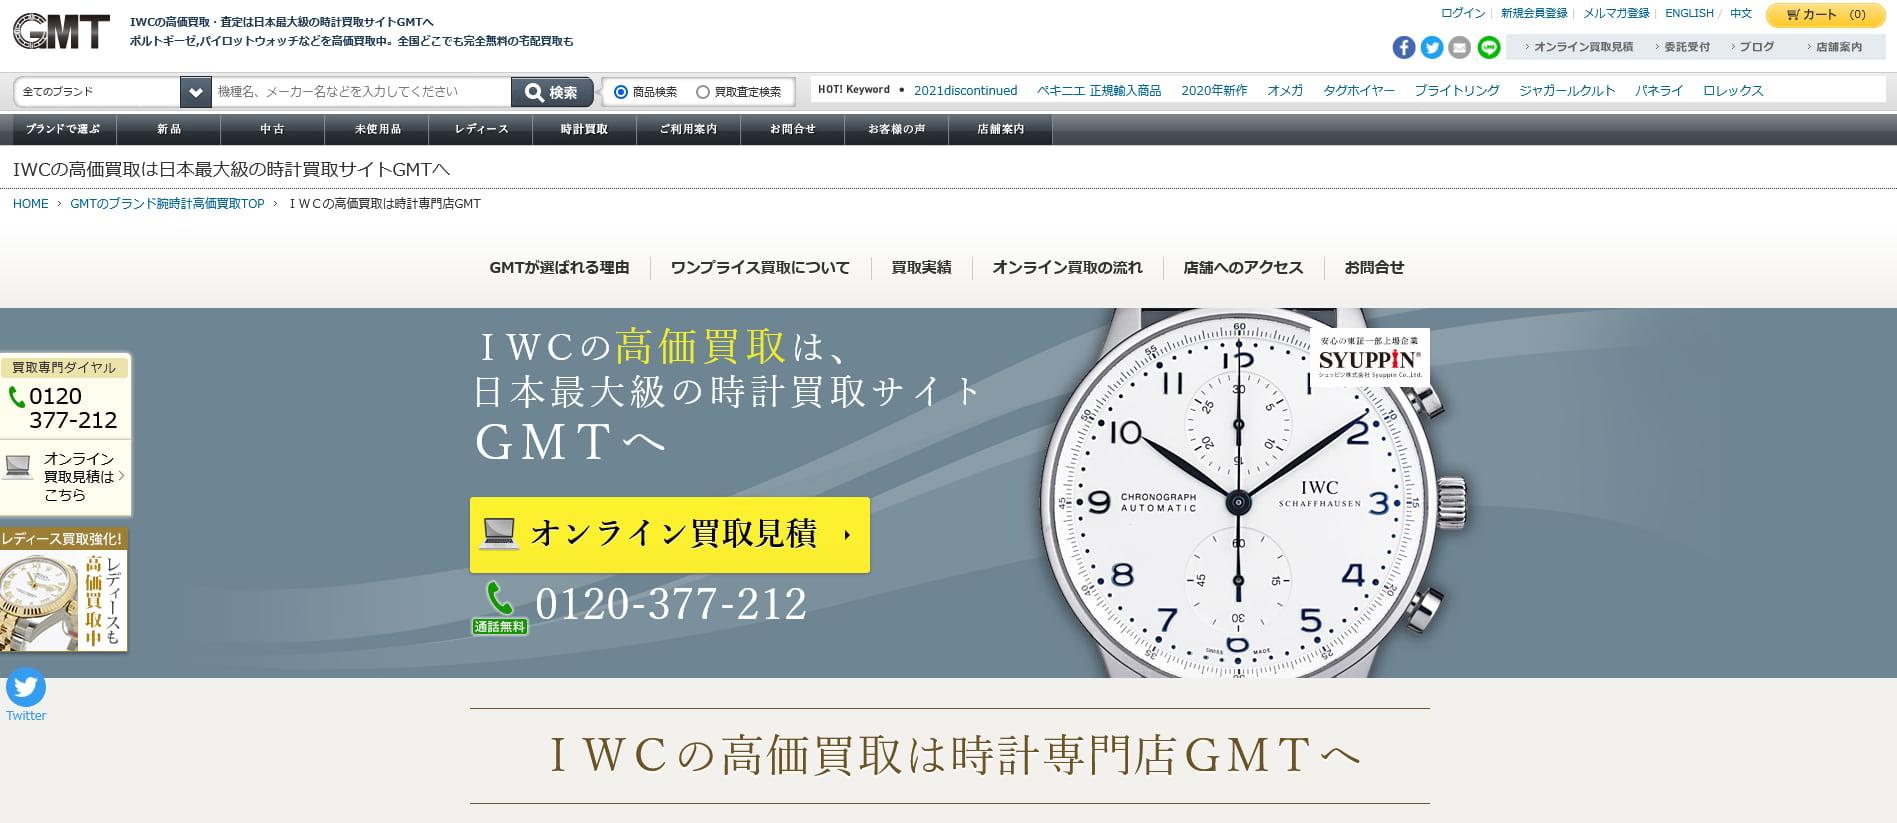 IWC買取のおすすめ店GMT